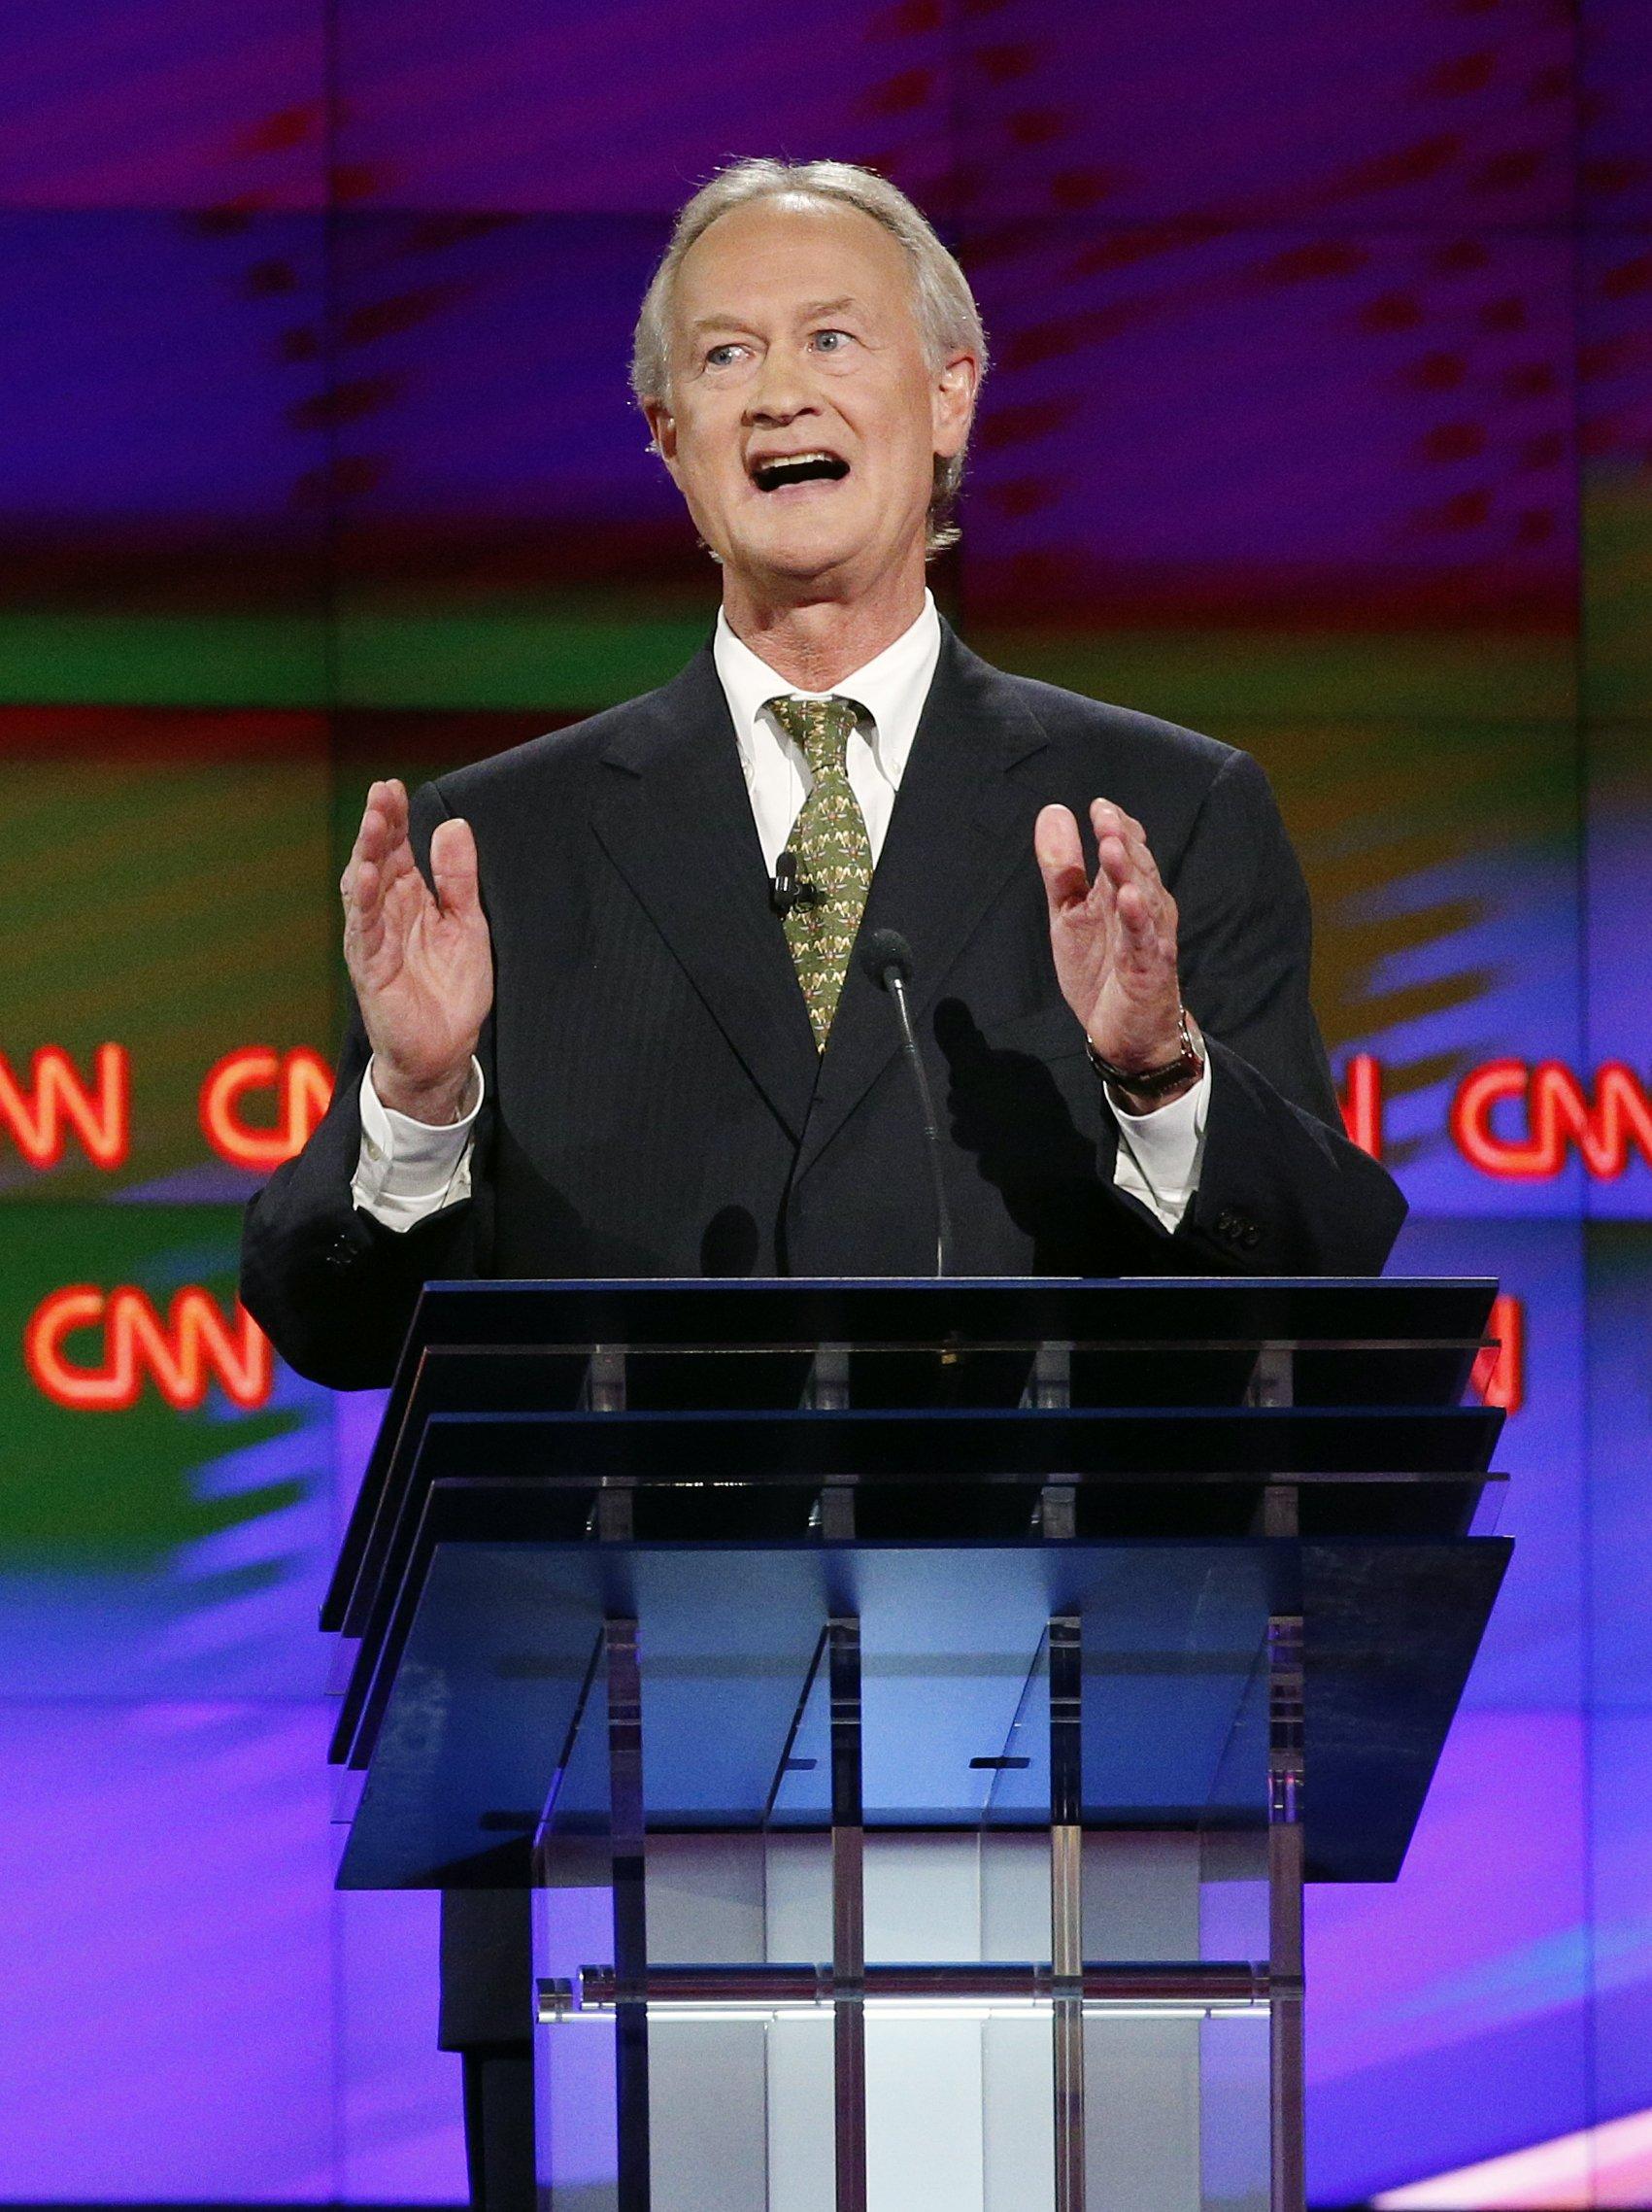 Former Rhode Island Gov. Lincoln Chafee speaks during the CNN Democratic presidential debate, on Oct. 13, 2015, in Las Vegas.